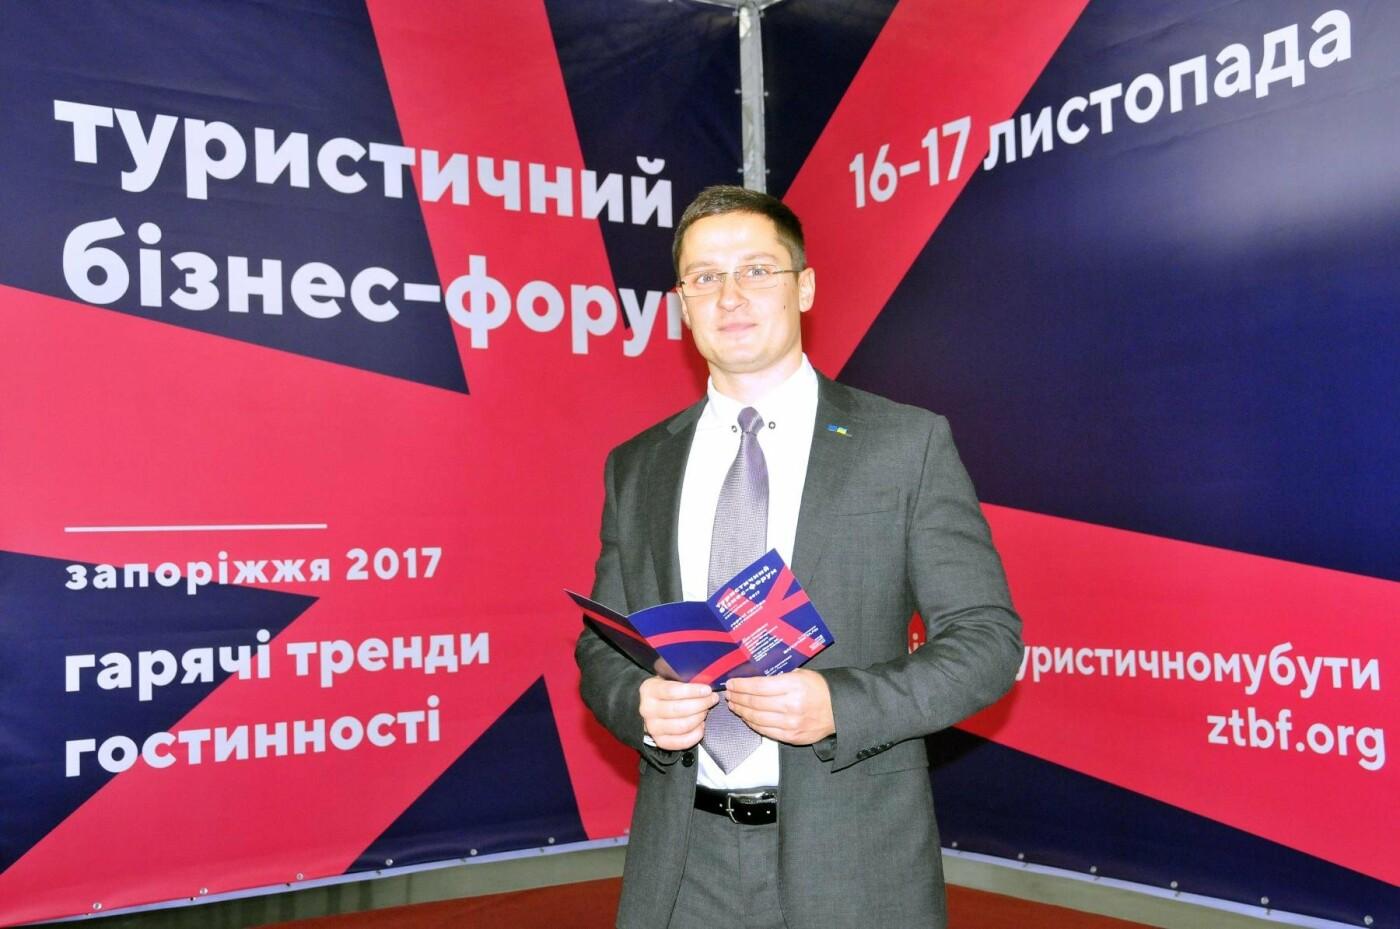 Владислав Марченко: «Запорожский край - перспективный центр туризма», фото-1